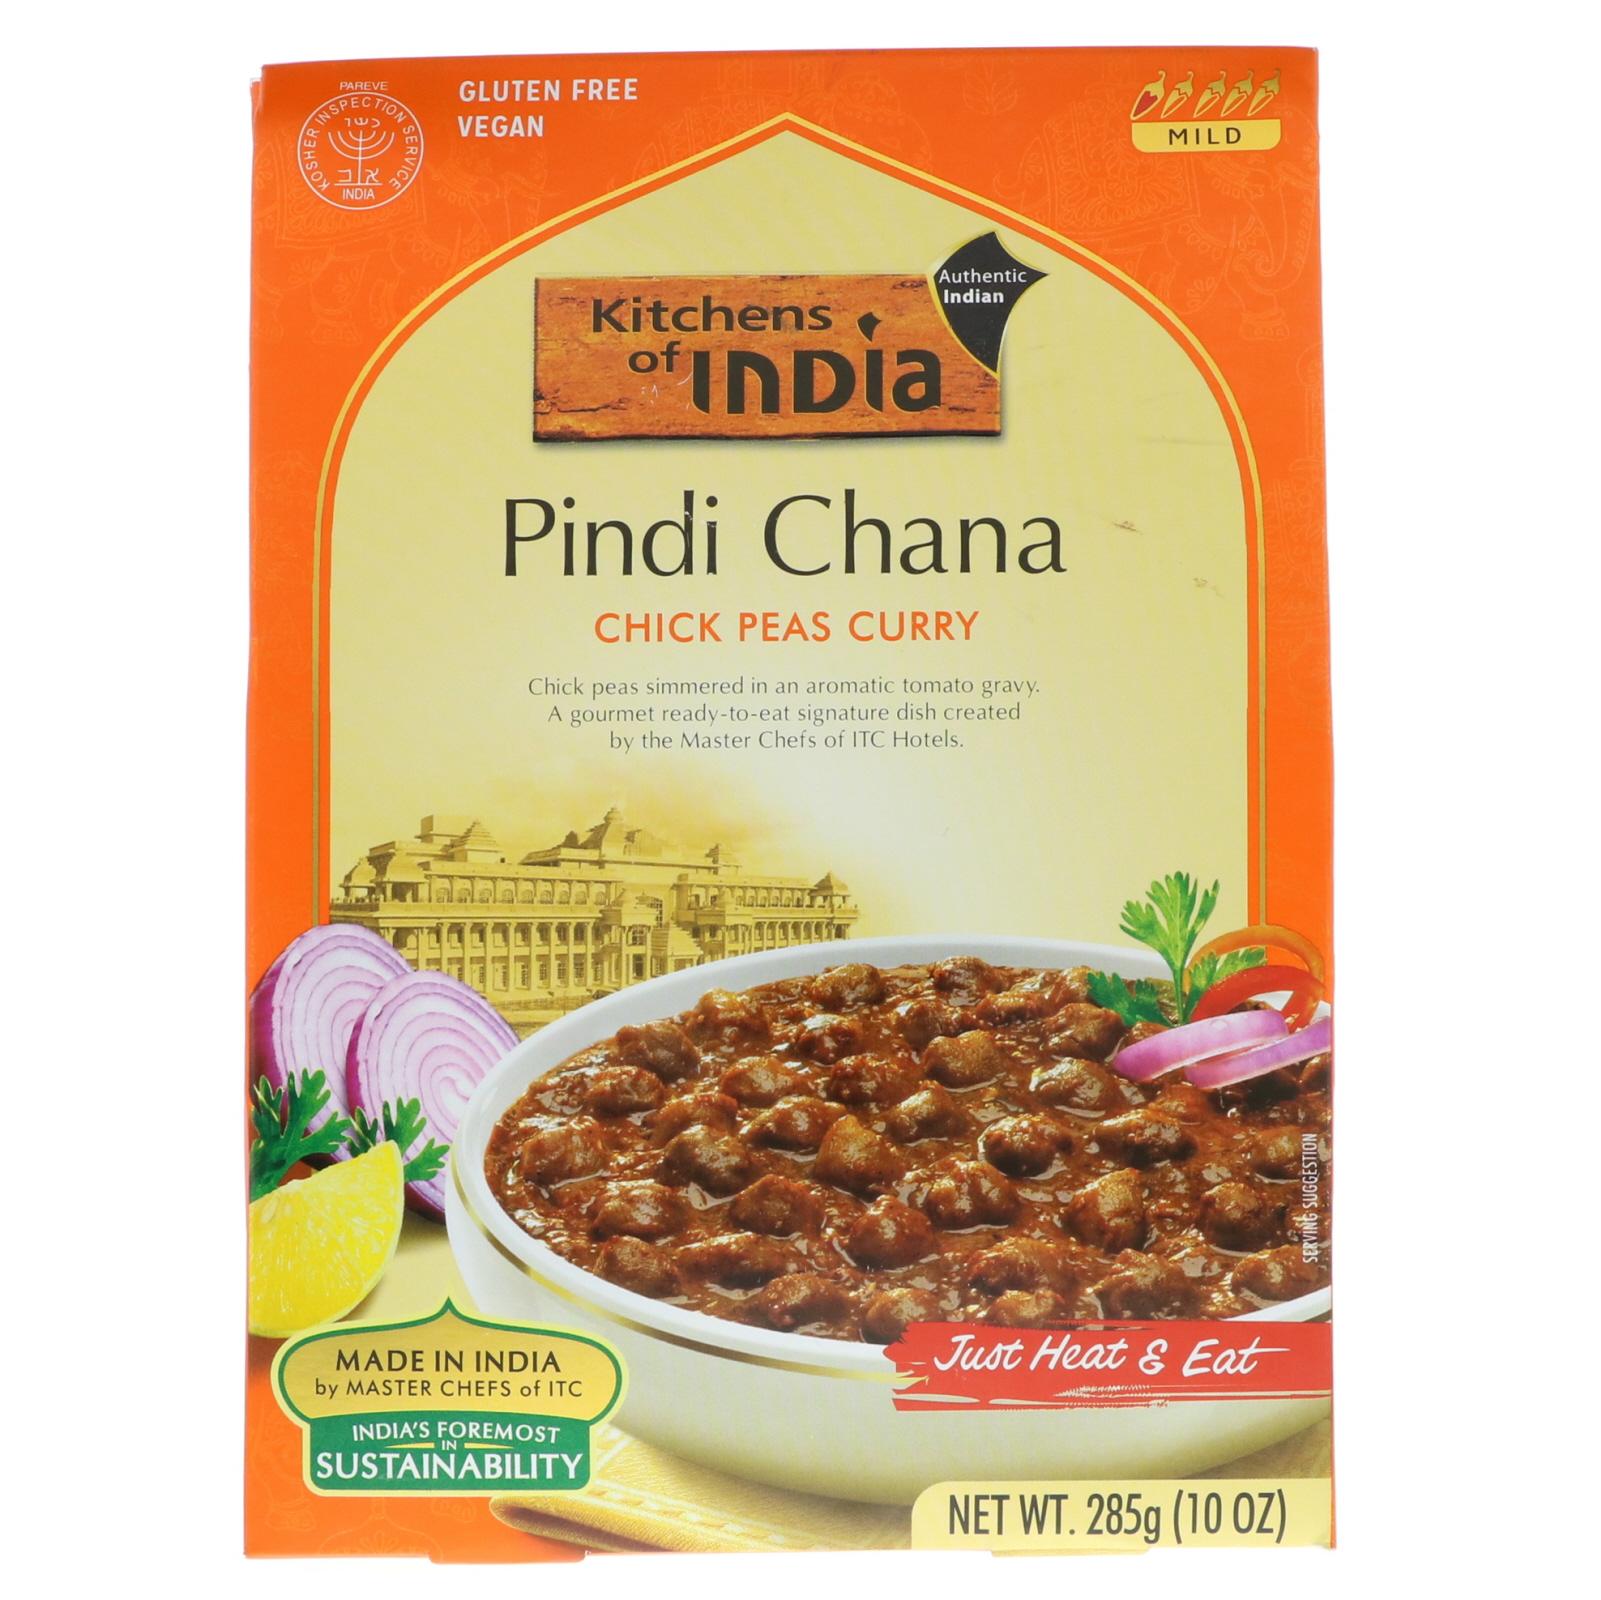 kitchens of india home depot glass tile kitchen backsplash pindi chana chick peas curry mild 10 oz 285 g iherb com